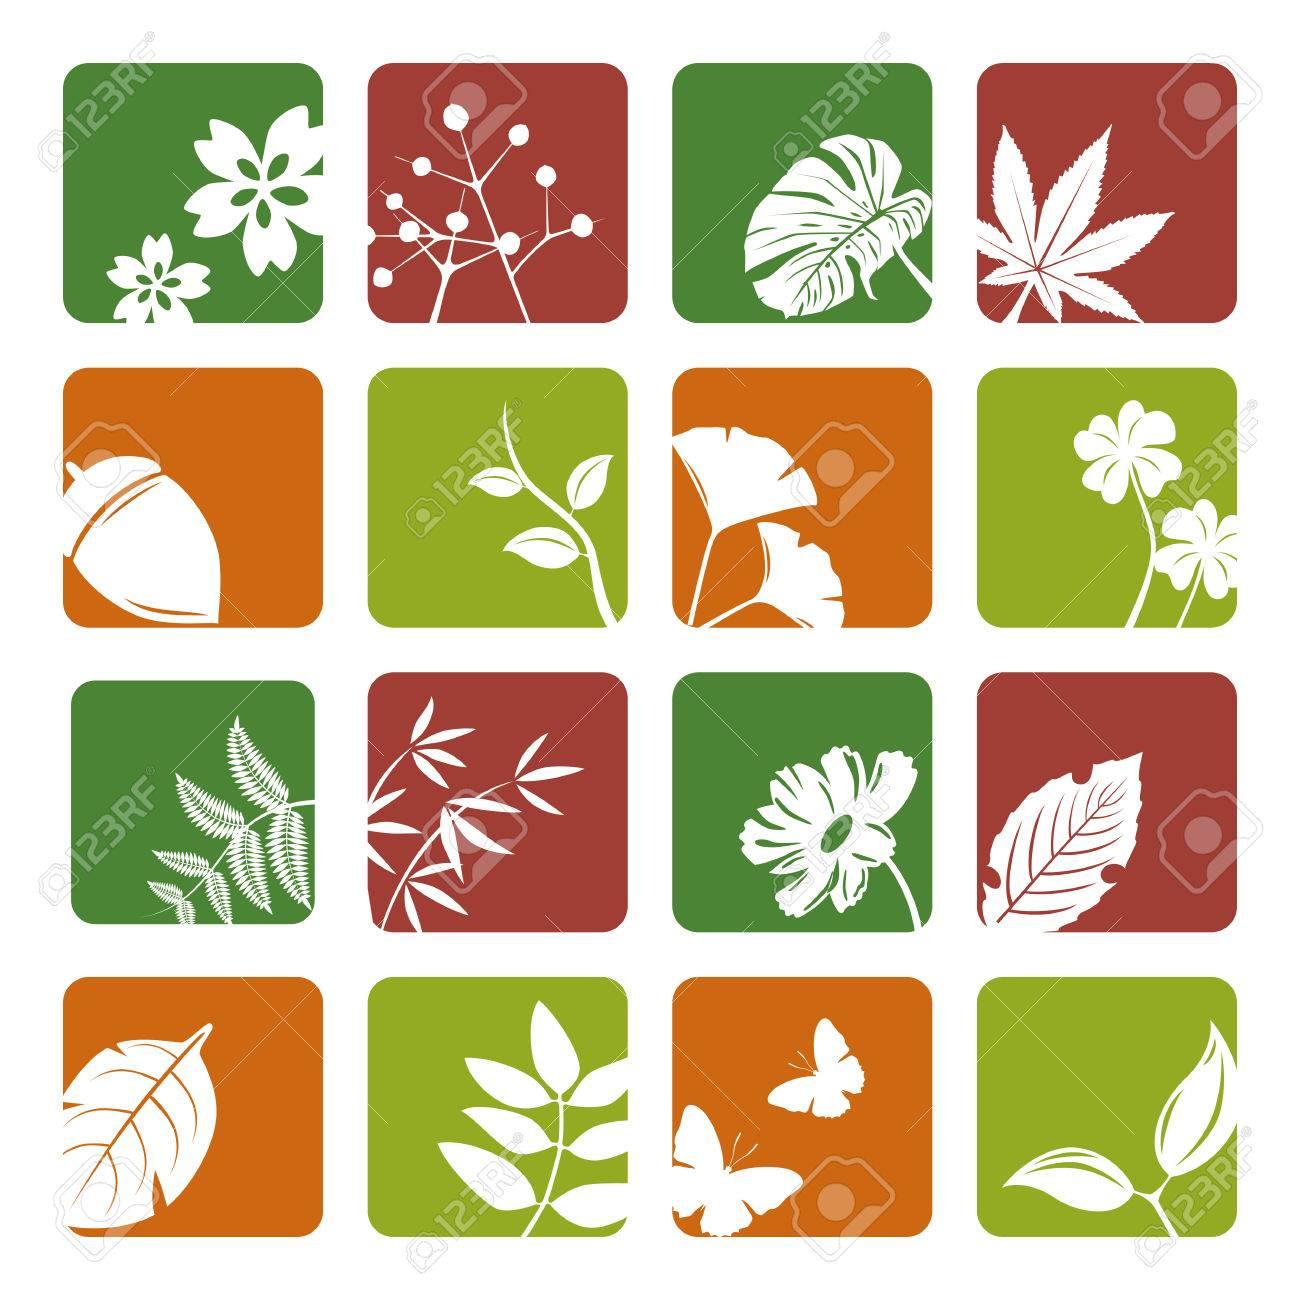 Leaf icons set. Illustration vector. Stock Vector - 8486565